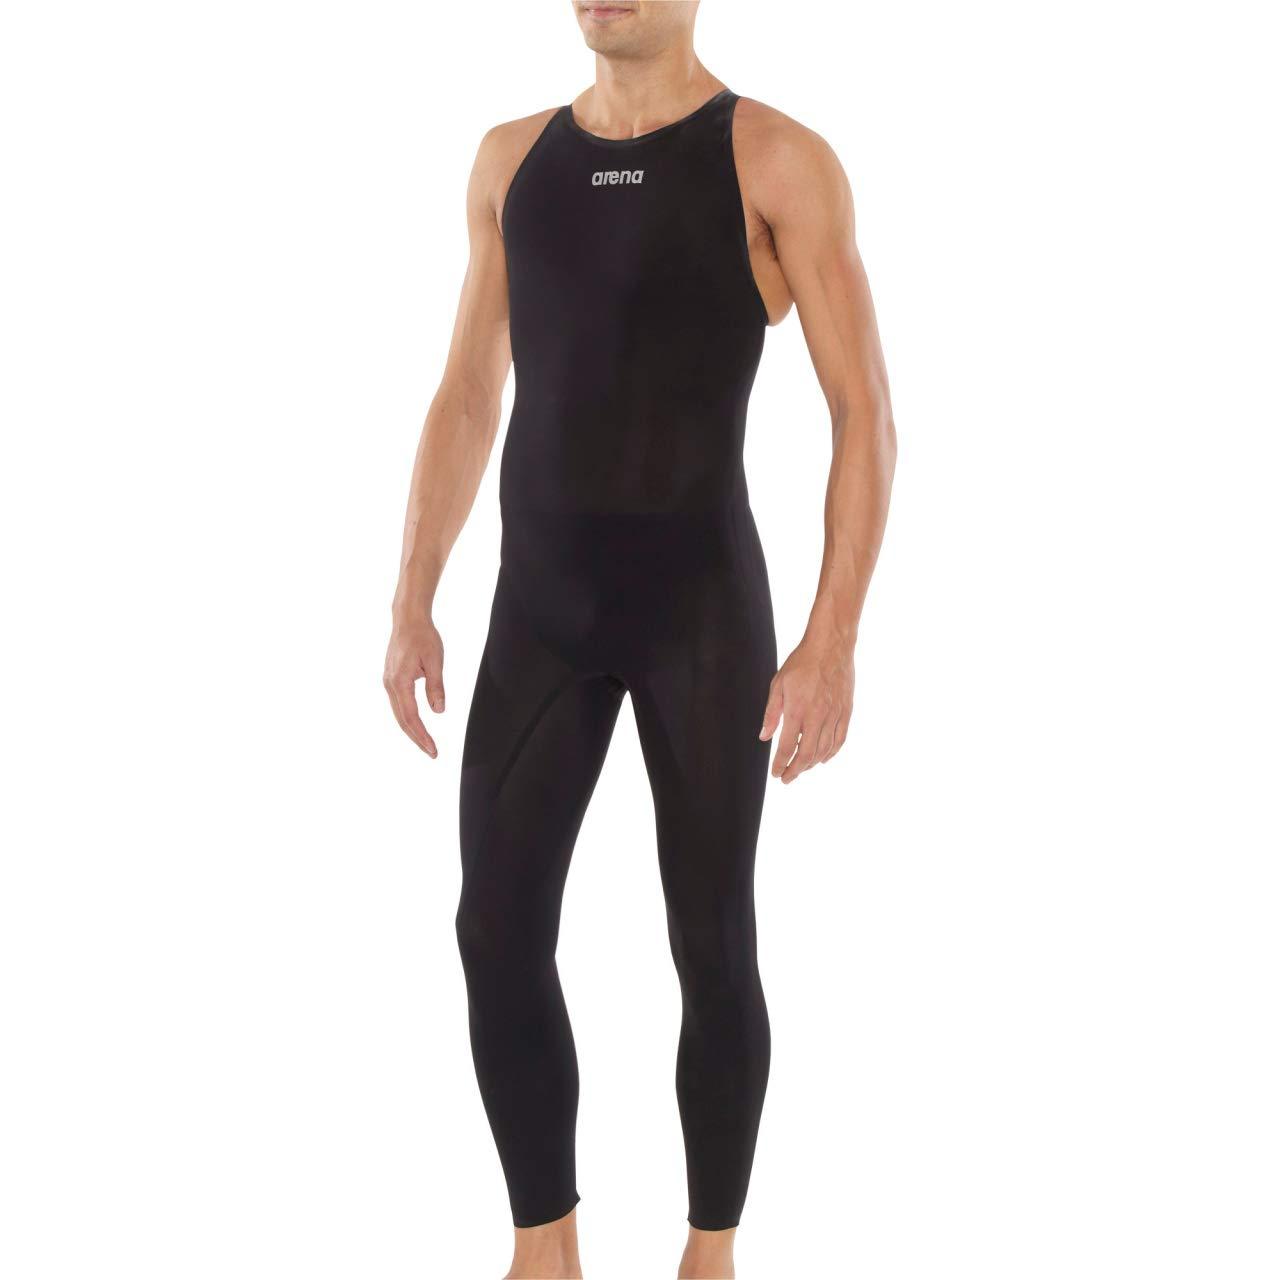 arena Powerskin R-Evo+ Open Water Closed Back Men's Racing Swimsuit, SL Black, 26